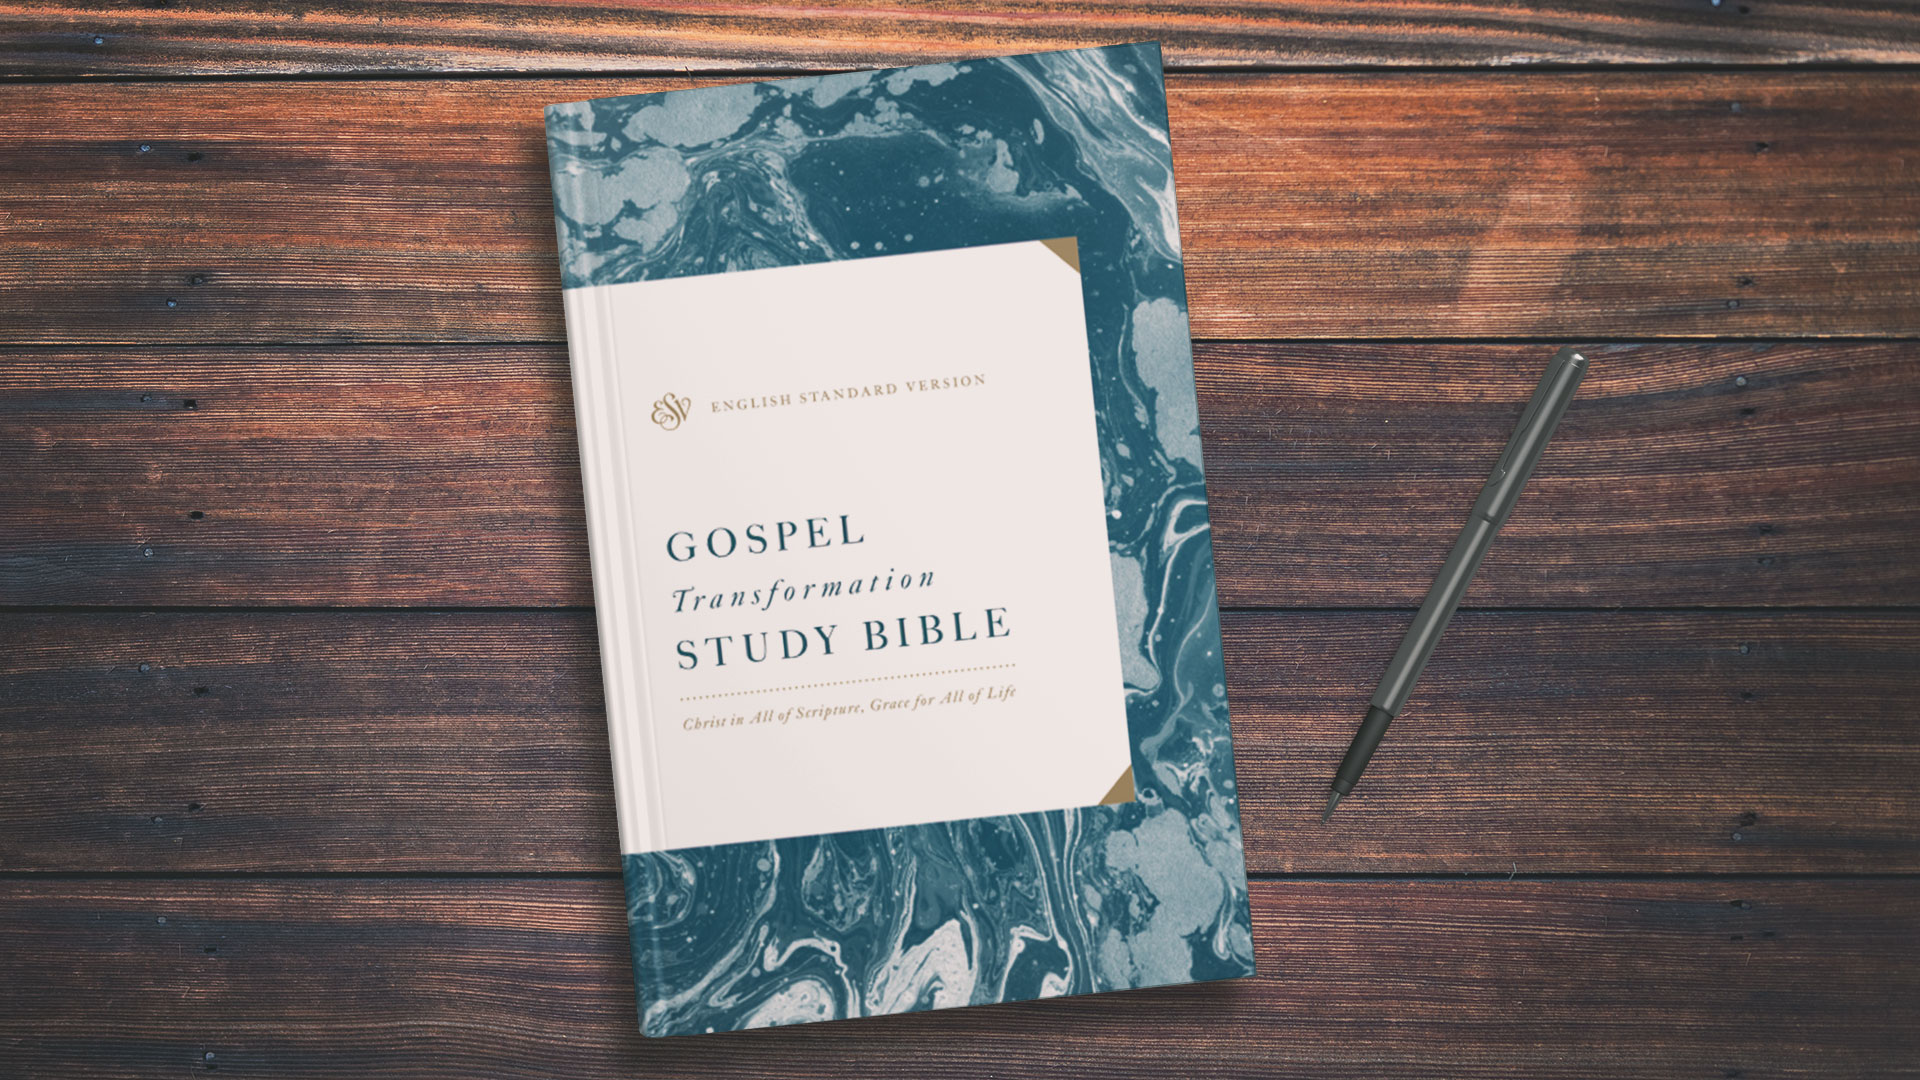 Gospel transformation study bible Jesus